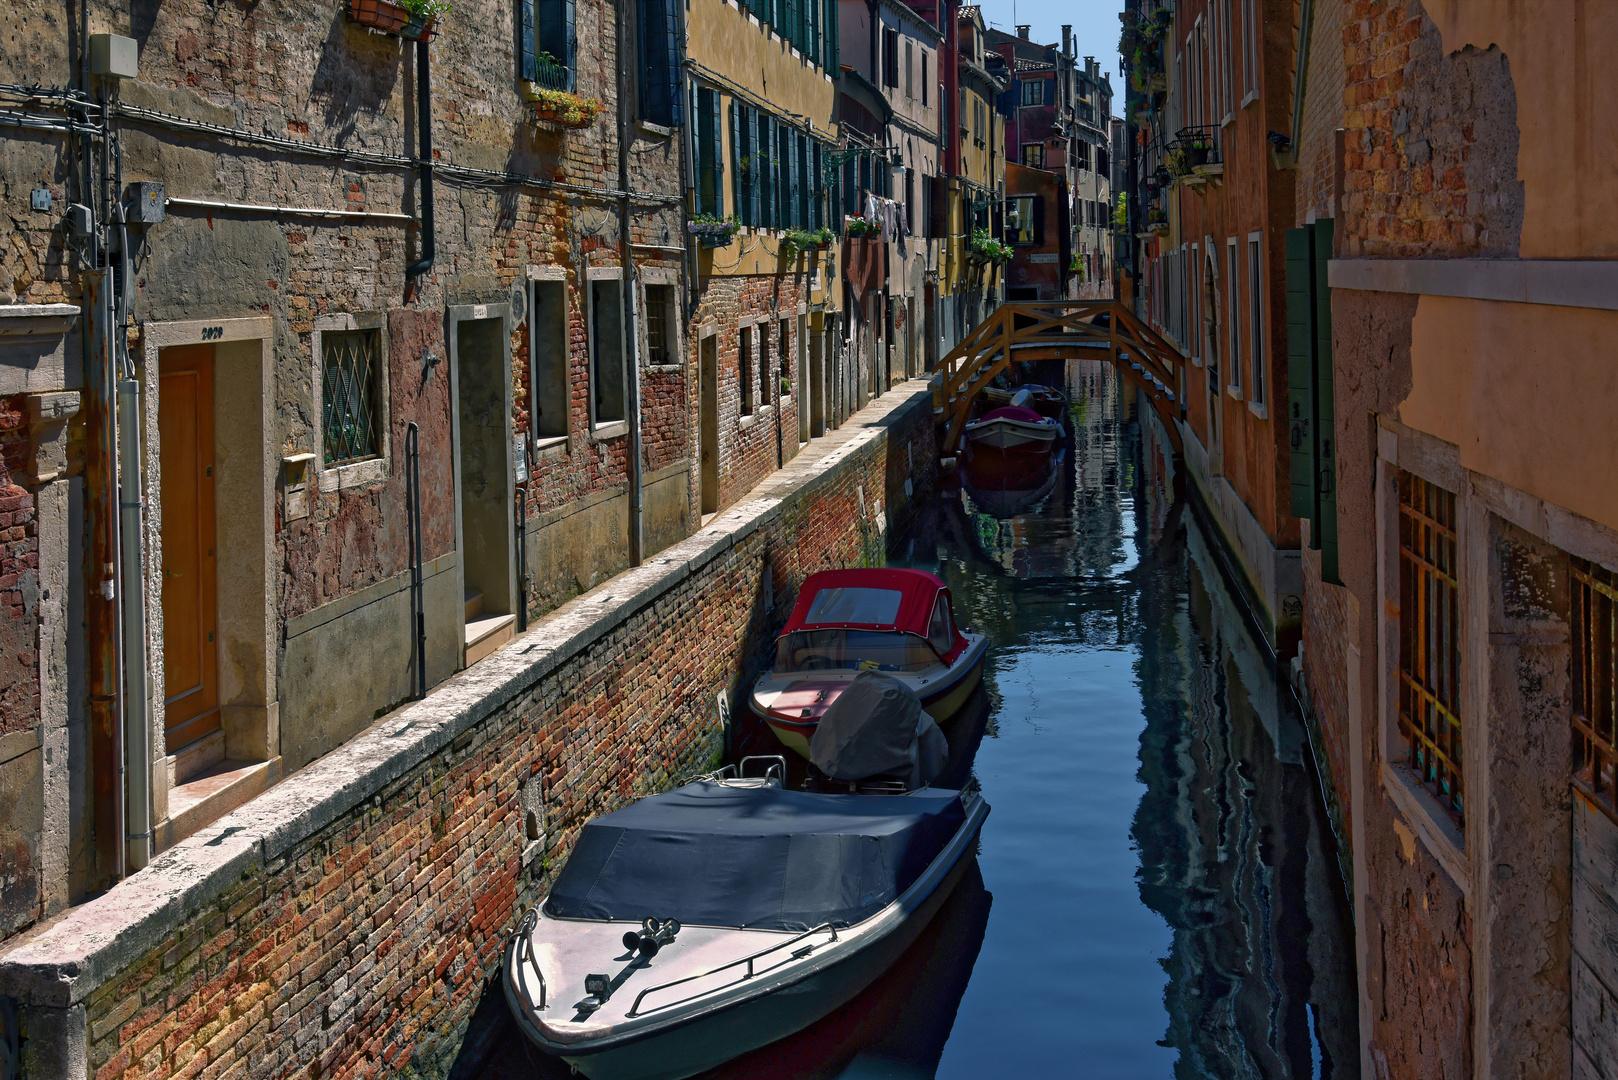 Streifzug durch Venedig